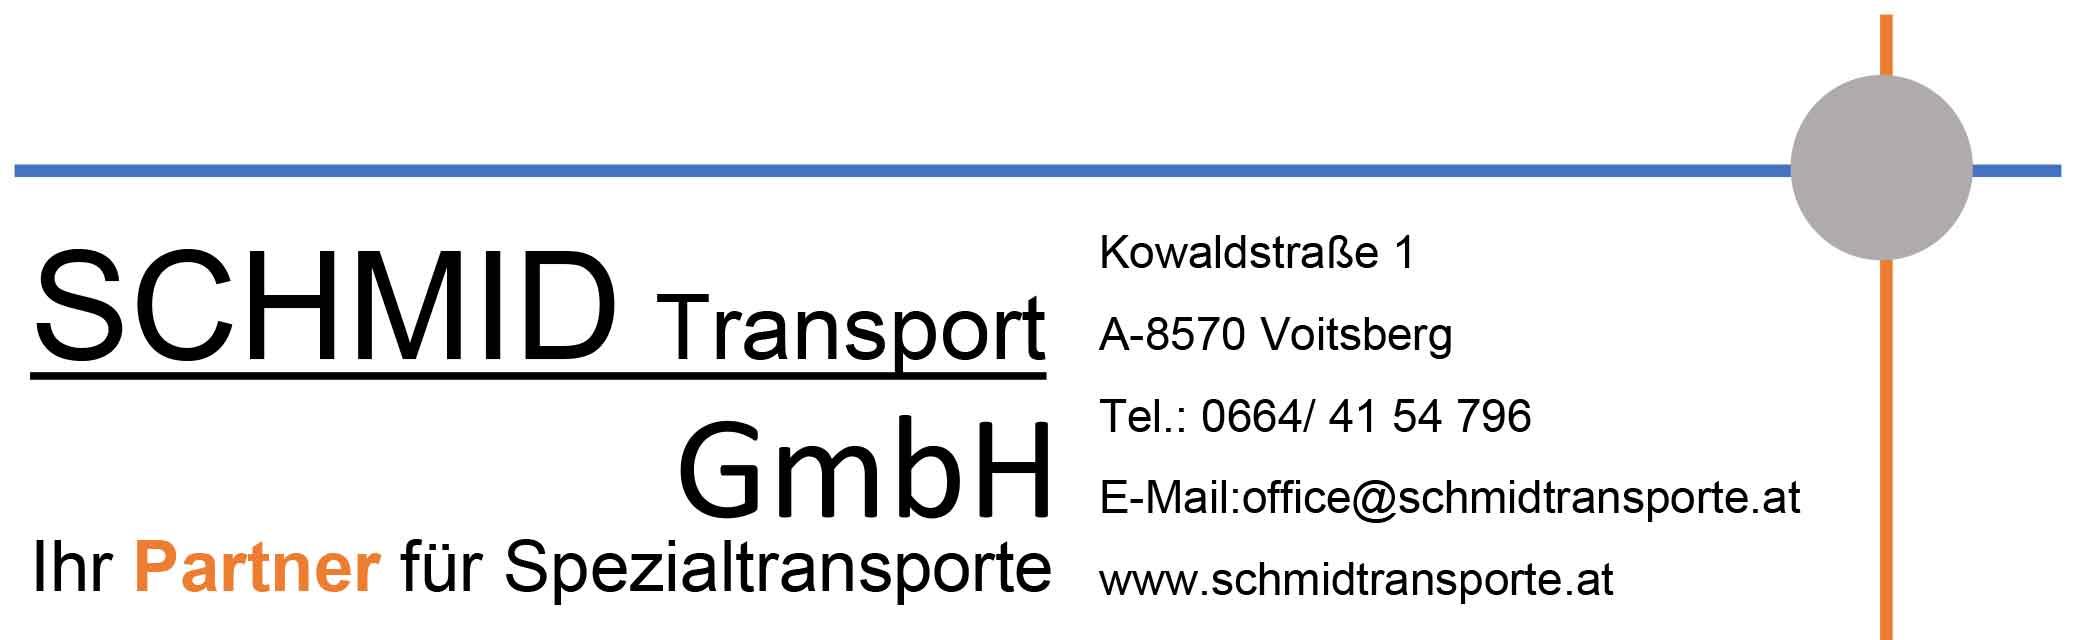 schmid transport